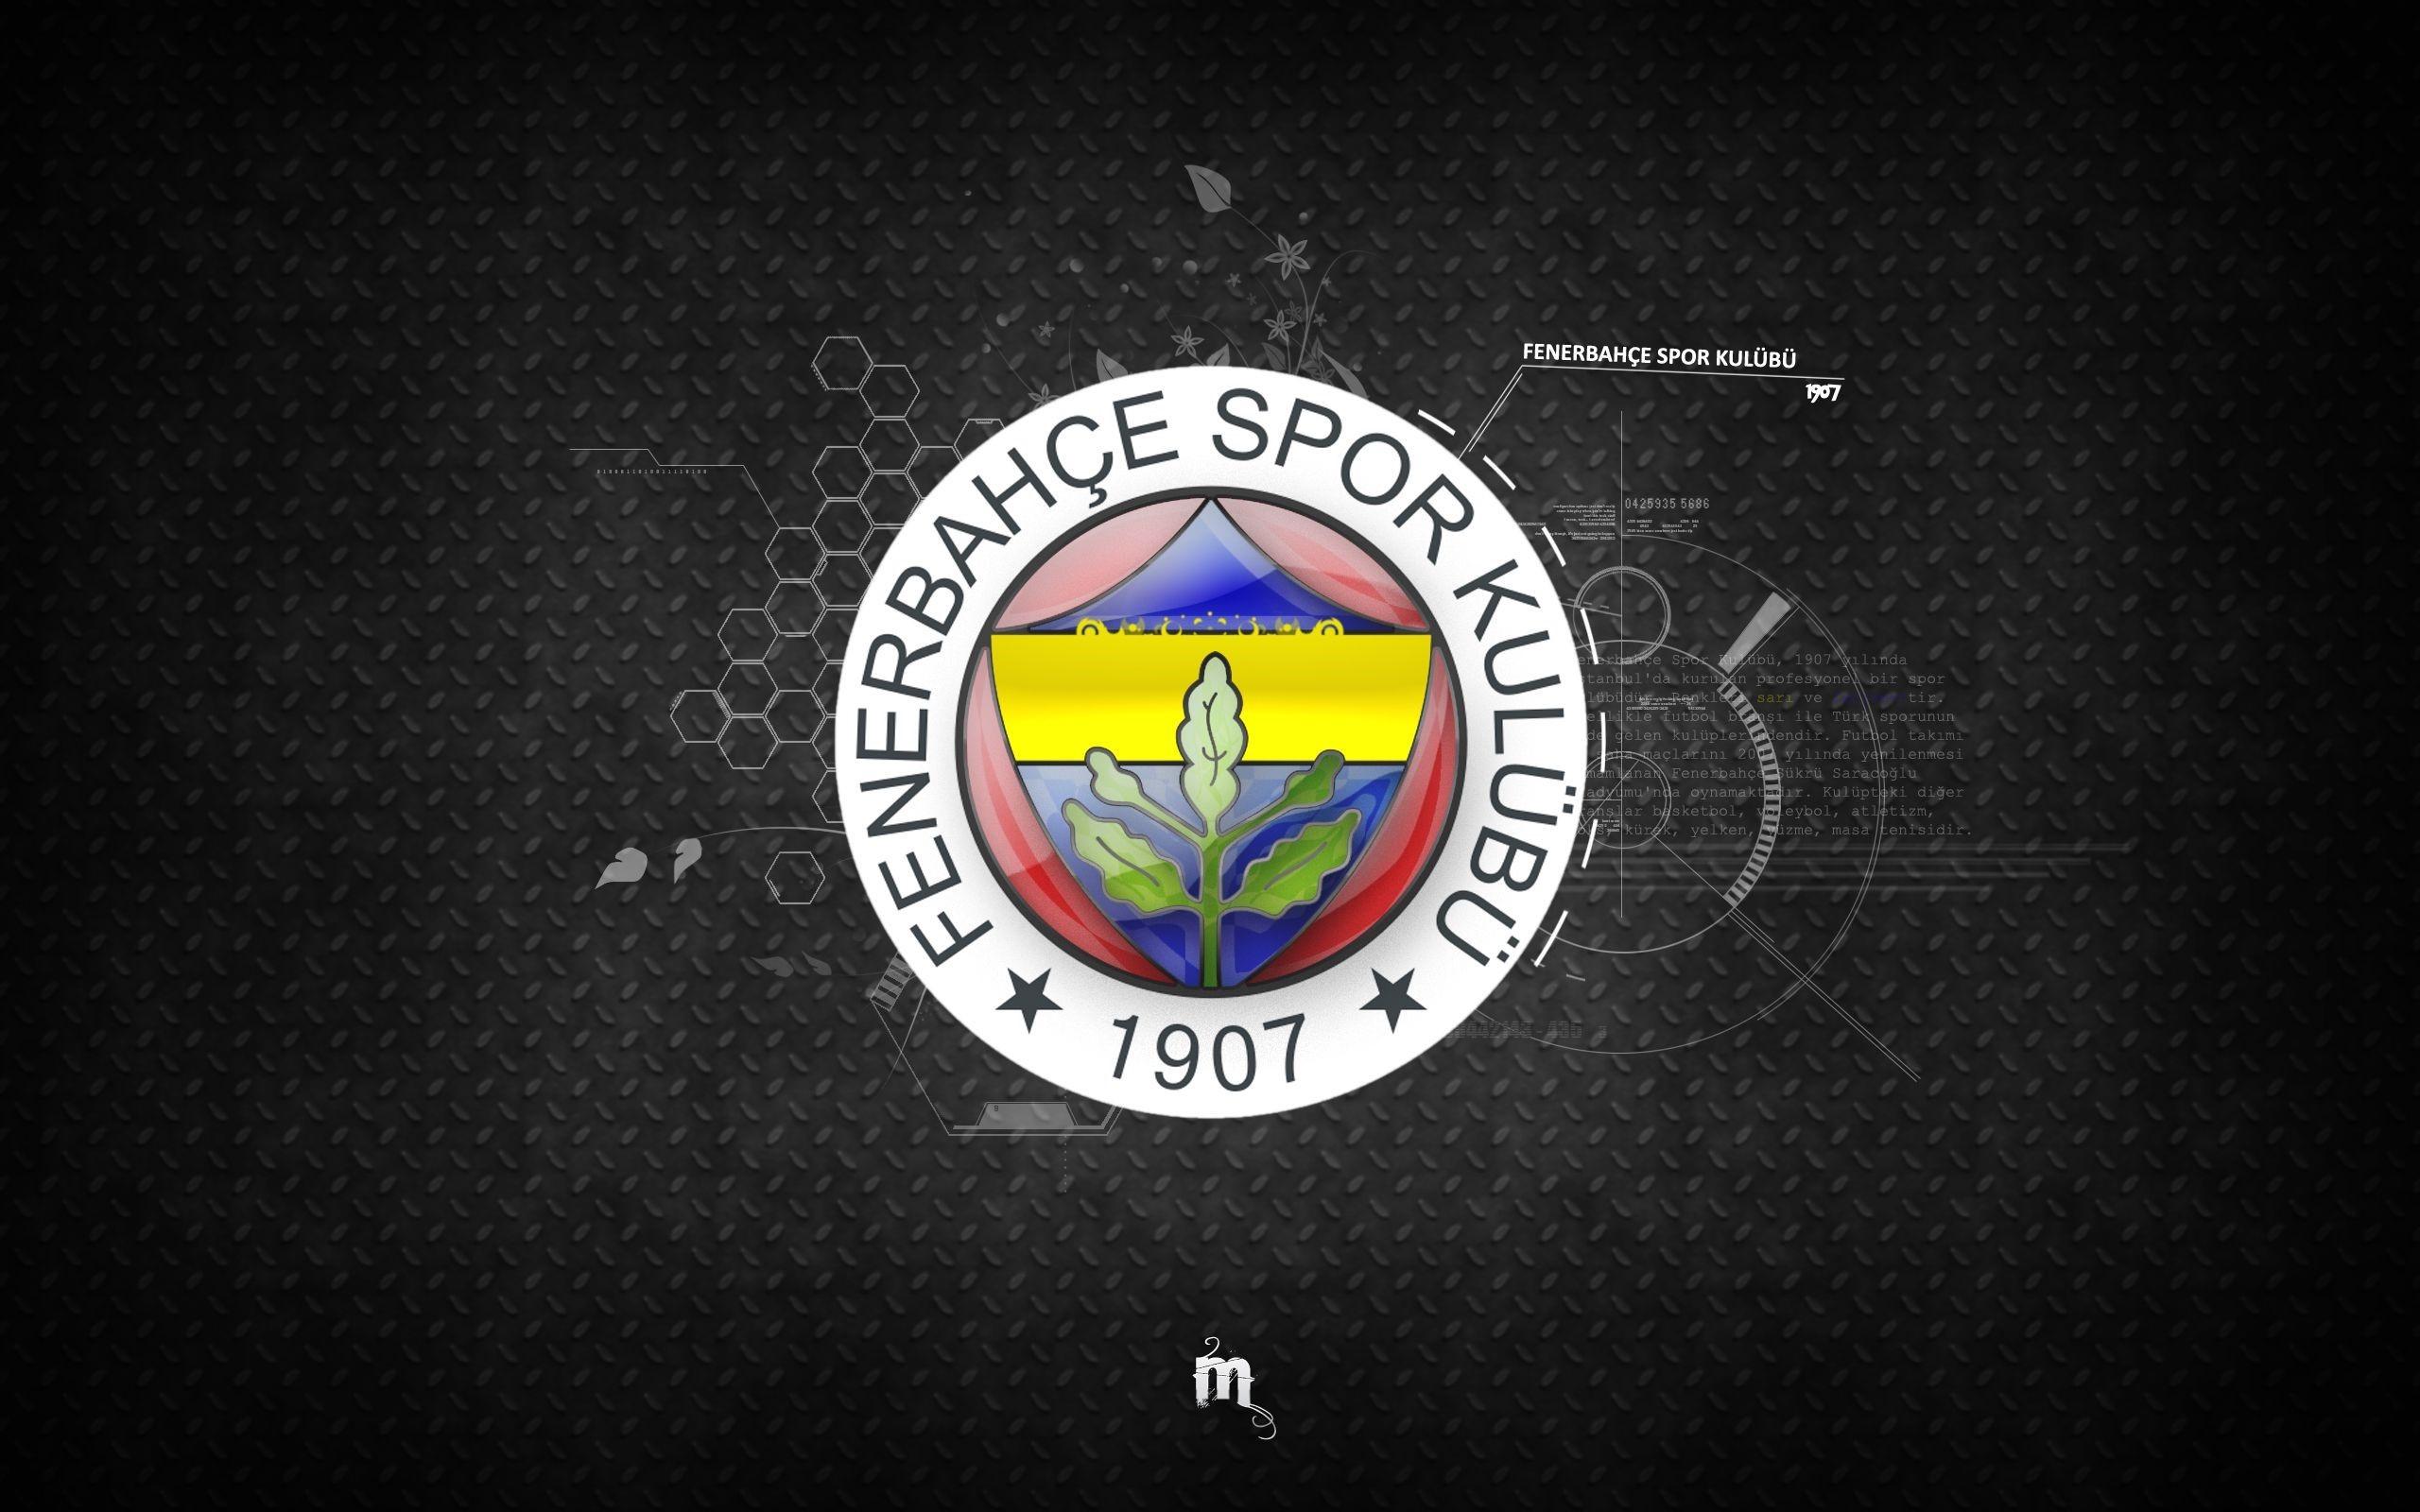 Fenerbahçe HD Wallpapers